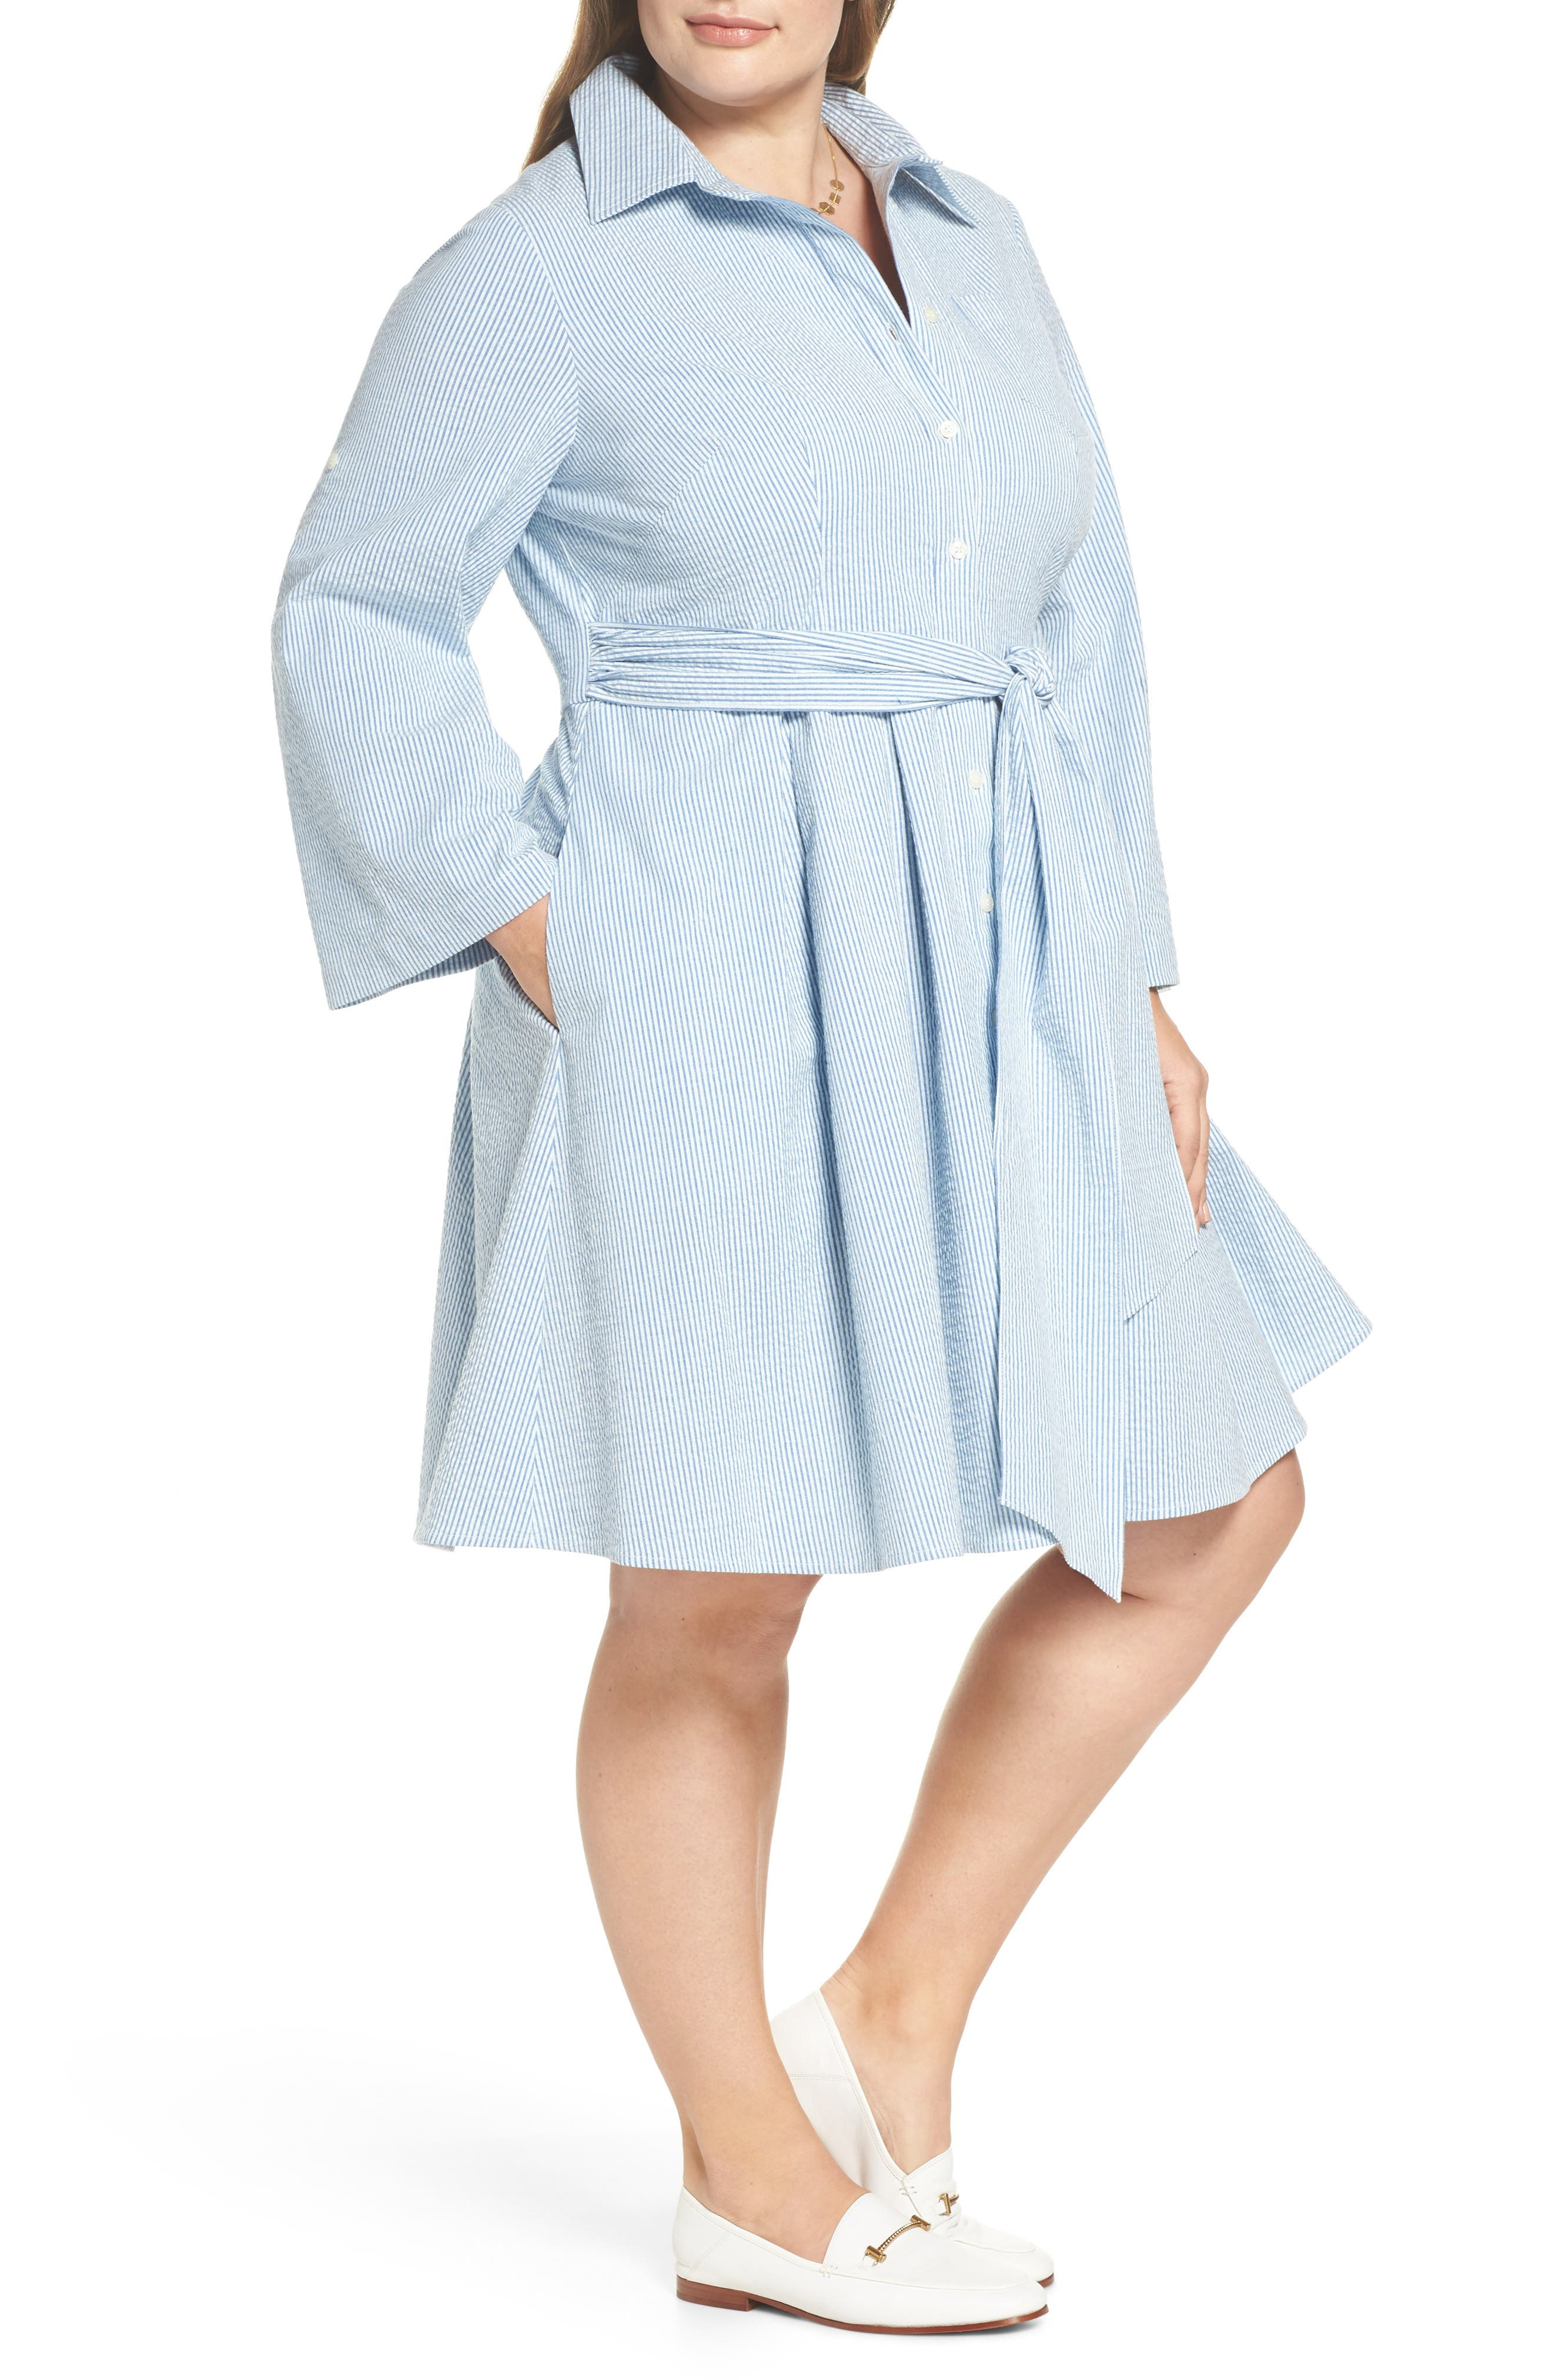 Seersucker Shirtdress,                             Alternate thumbnail 3, color,                             Blue Seersucker